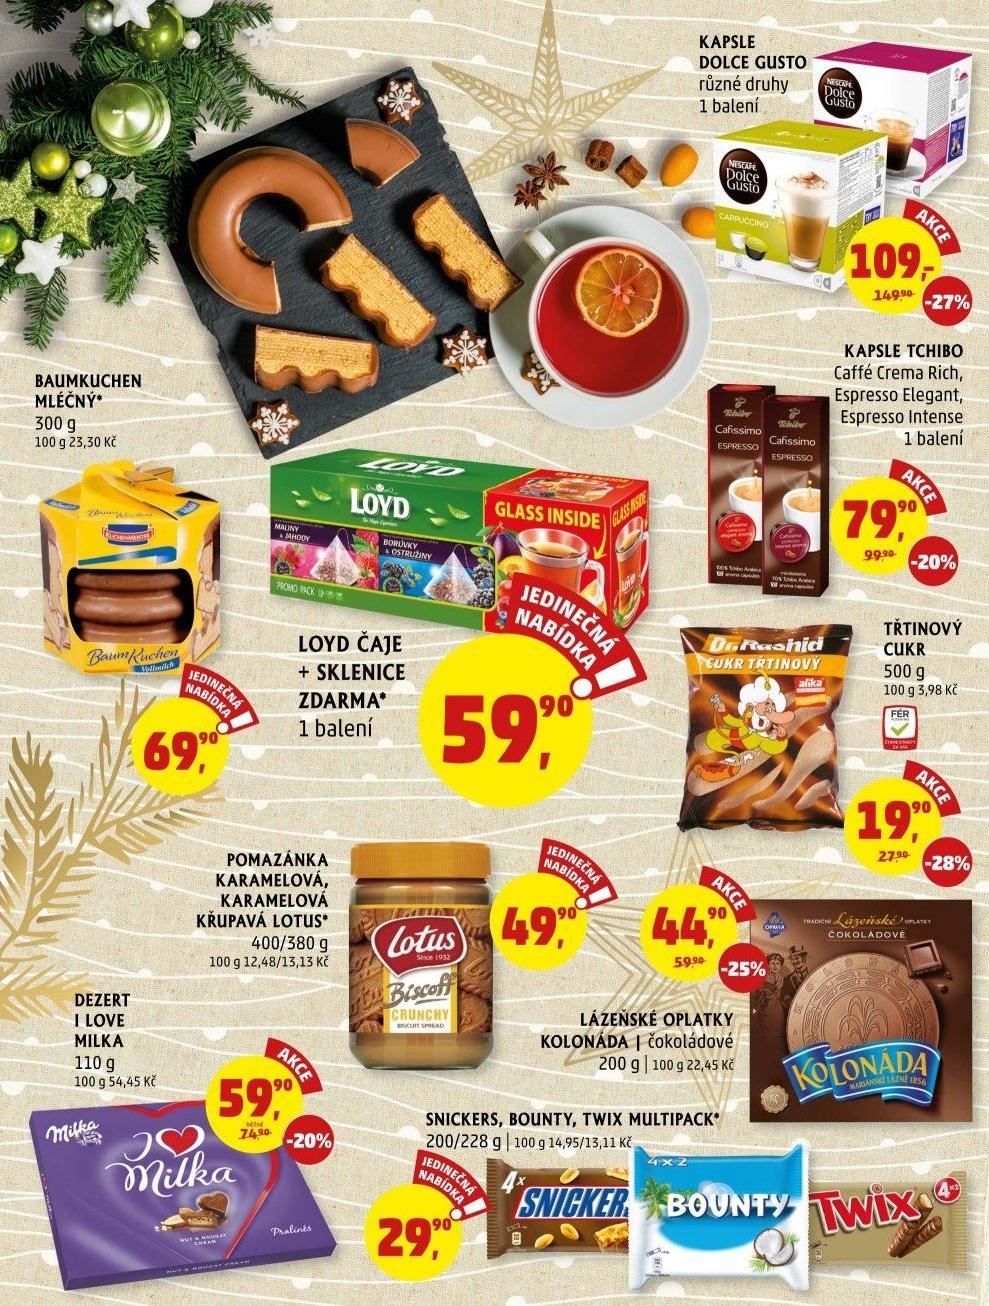 Baumkuchen Kuchen Meister V Akci Penny Market Od 14 12 2017